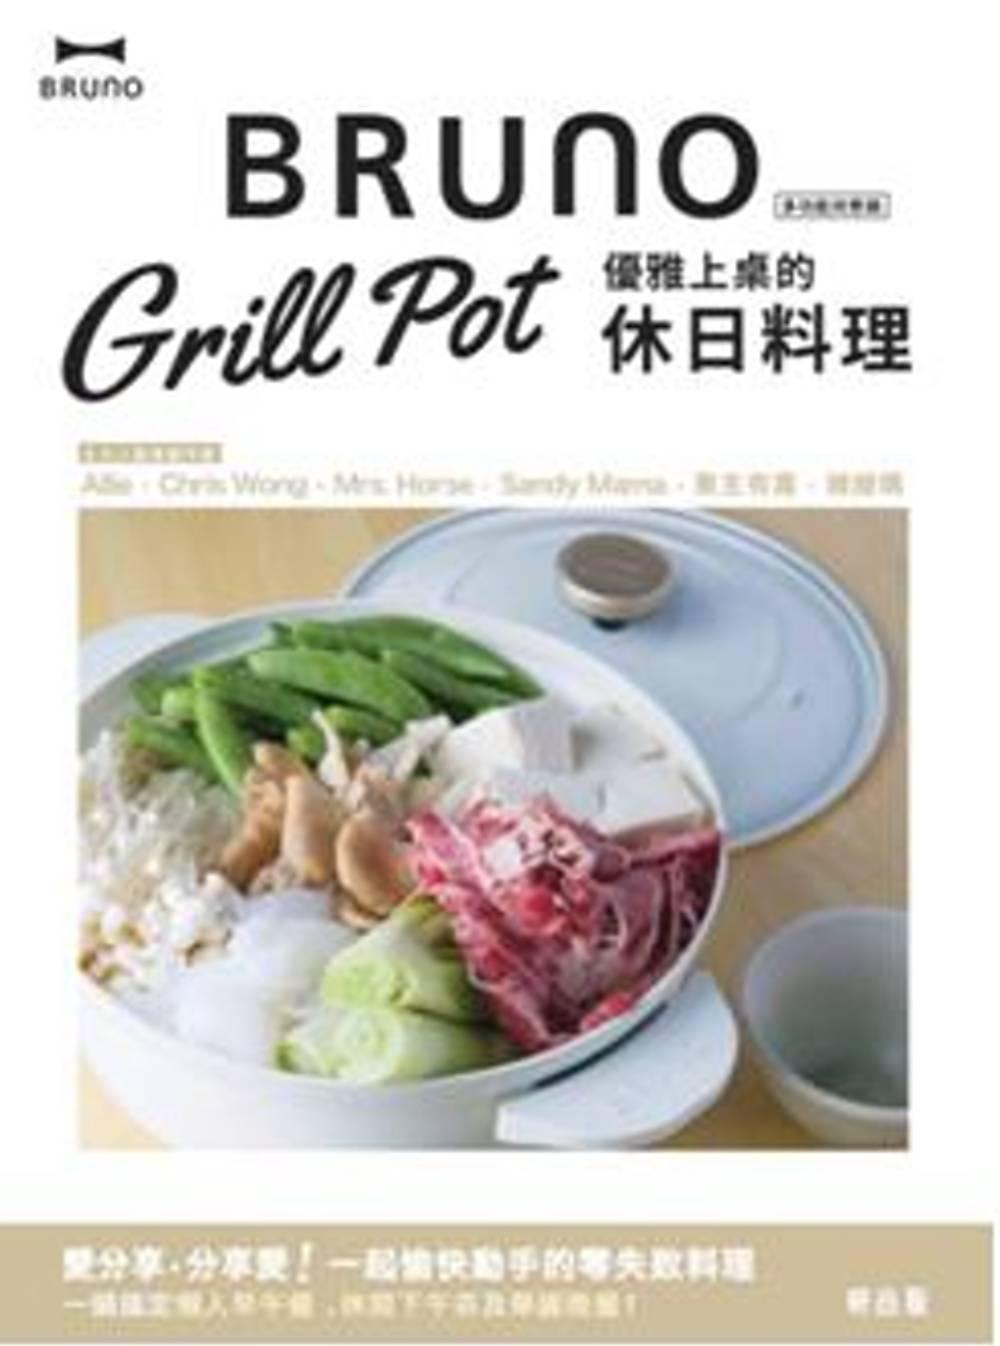 《Bruno Grill Pot 優雅上桌的休日料理》 商品條碼,ISBN:9789887826705